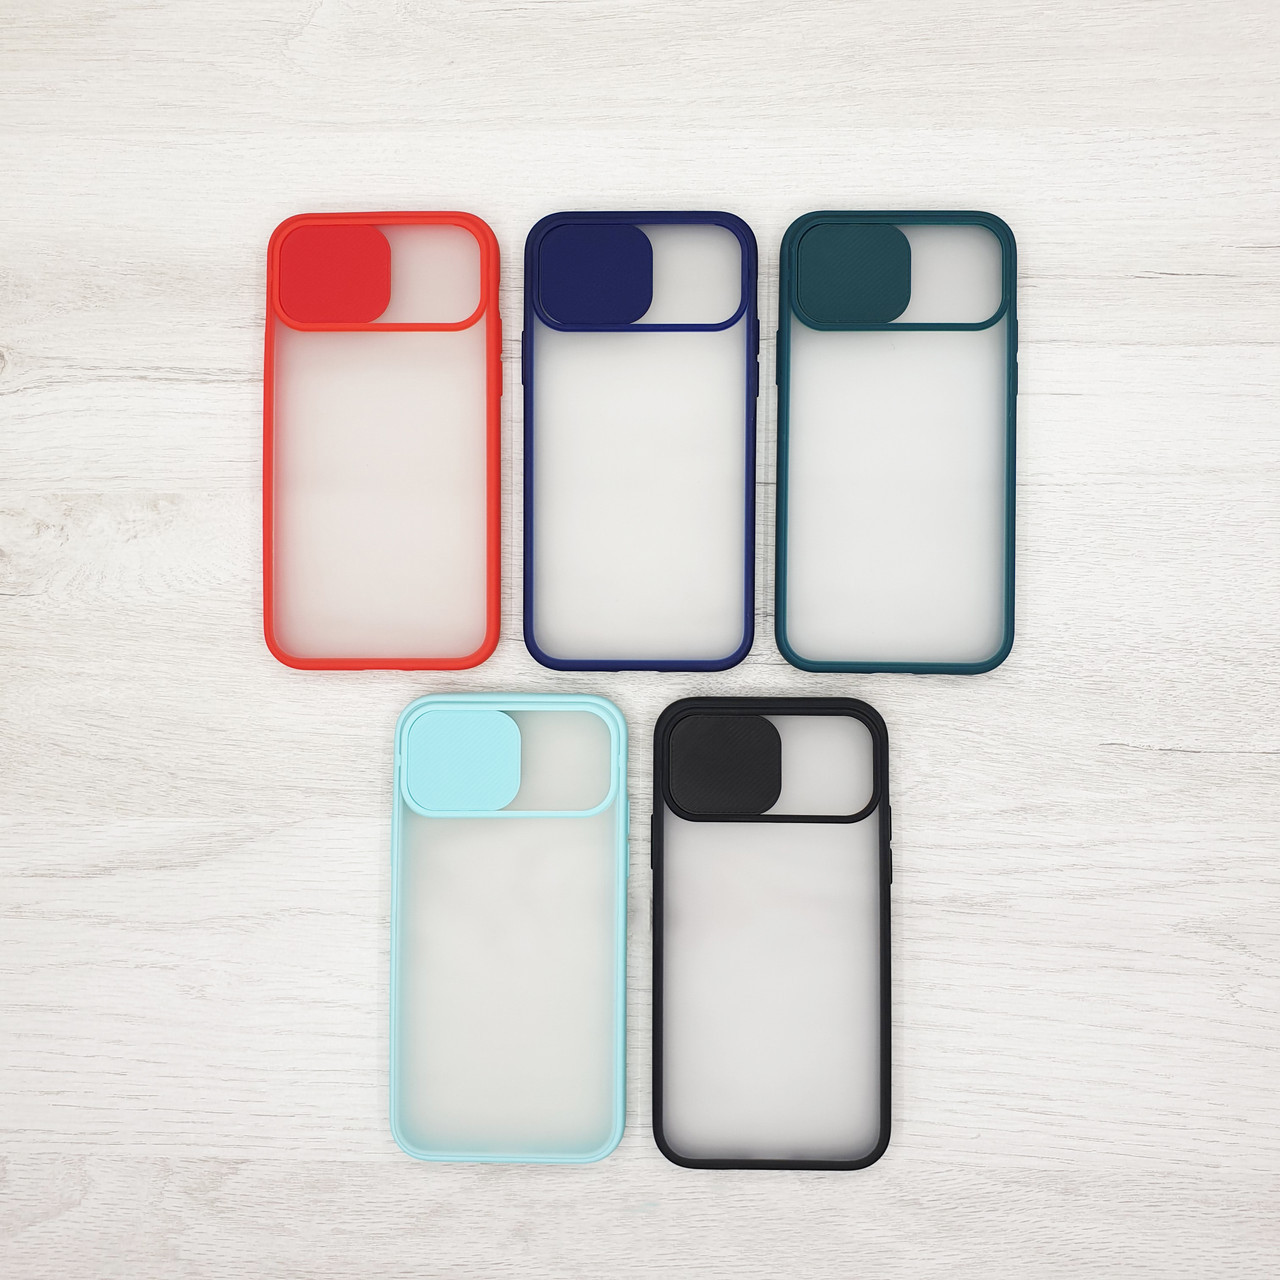 Чехол CASE для Apple iPhone 11 / 11Pro / 11ProMax (шторка на камеру) color